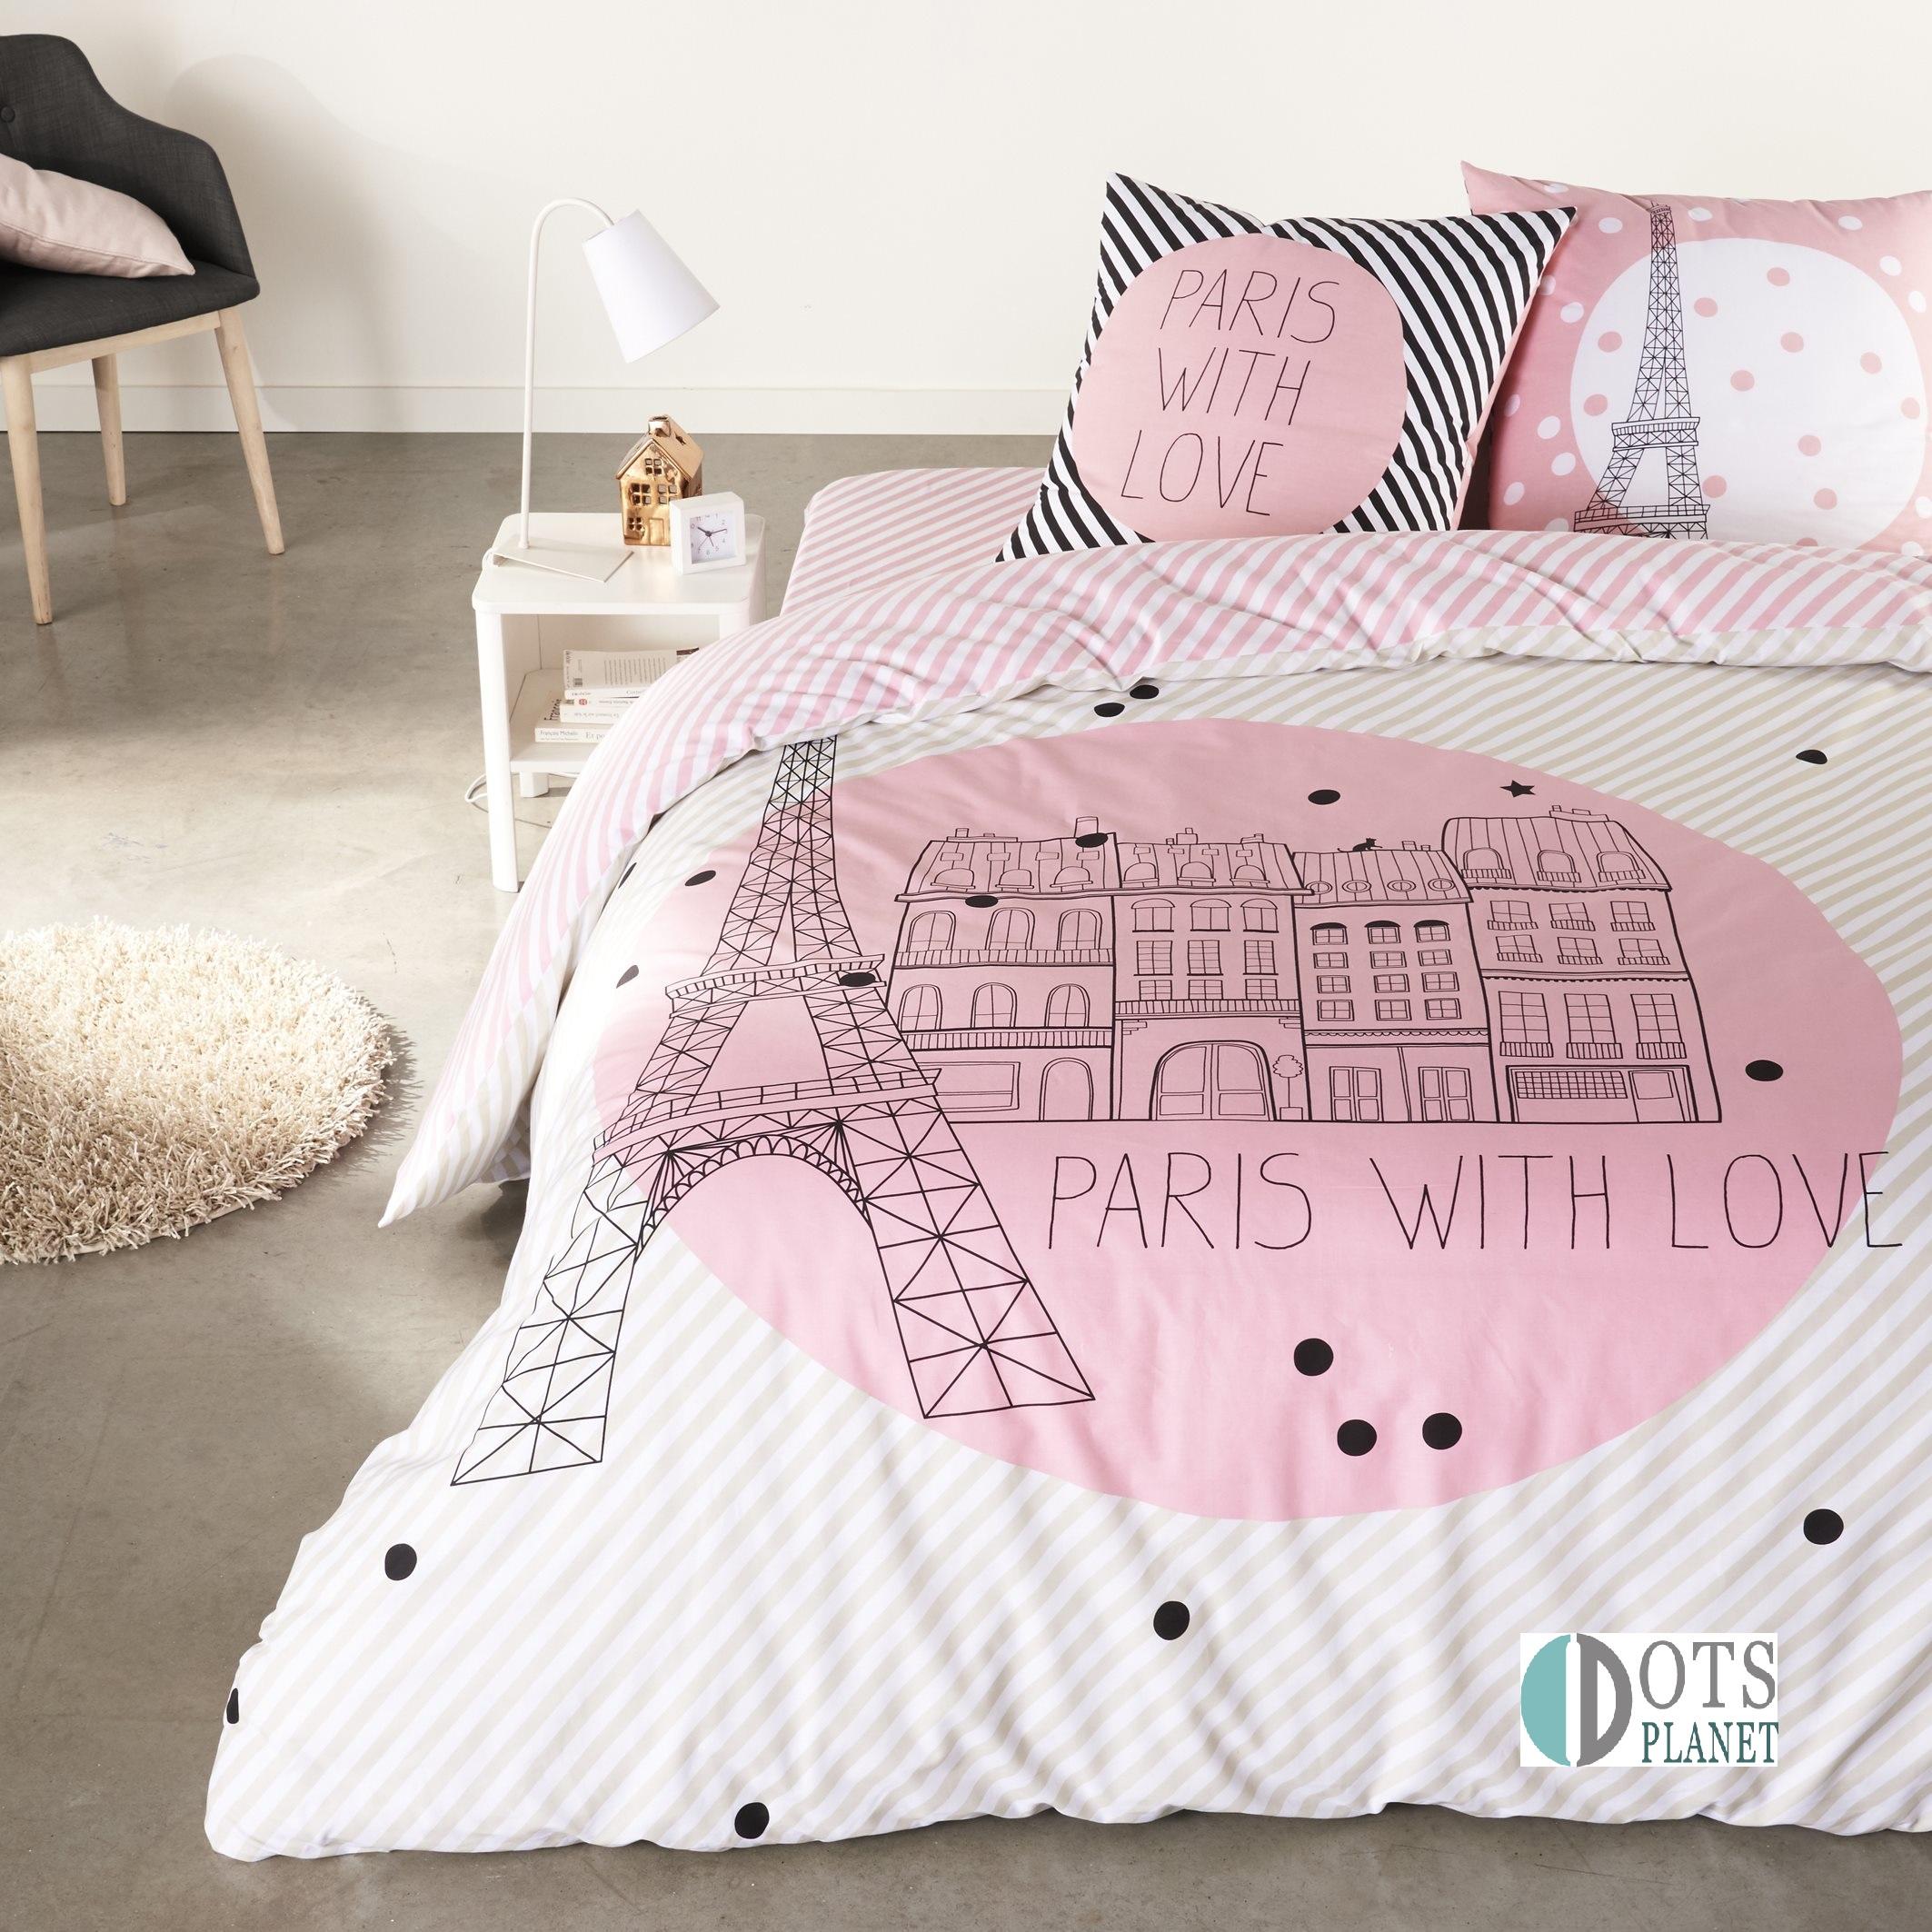 po ciel m odzie owa bawe niana 140x200 i love paris. Black Bedroom Furniture Sets. Home Design Ideas